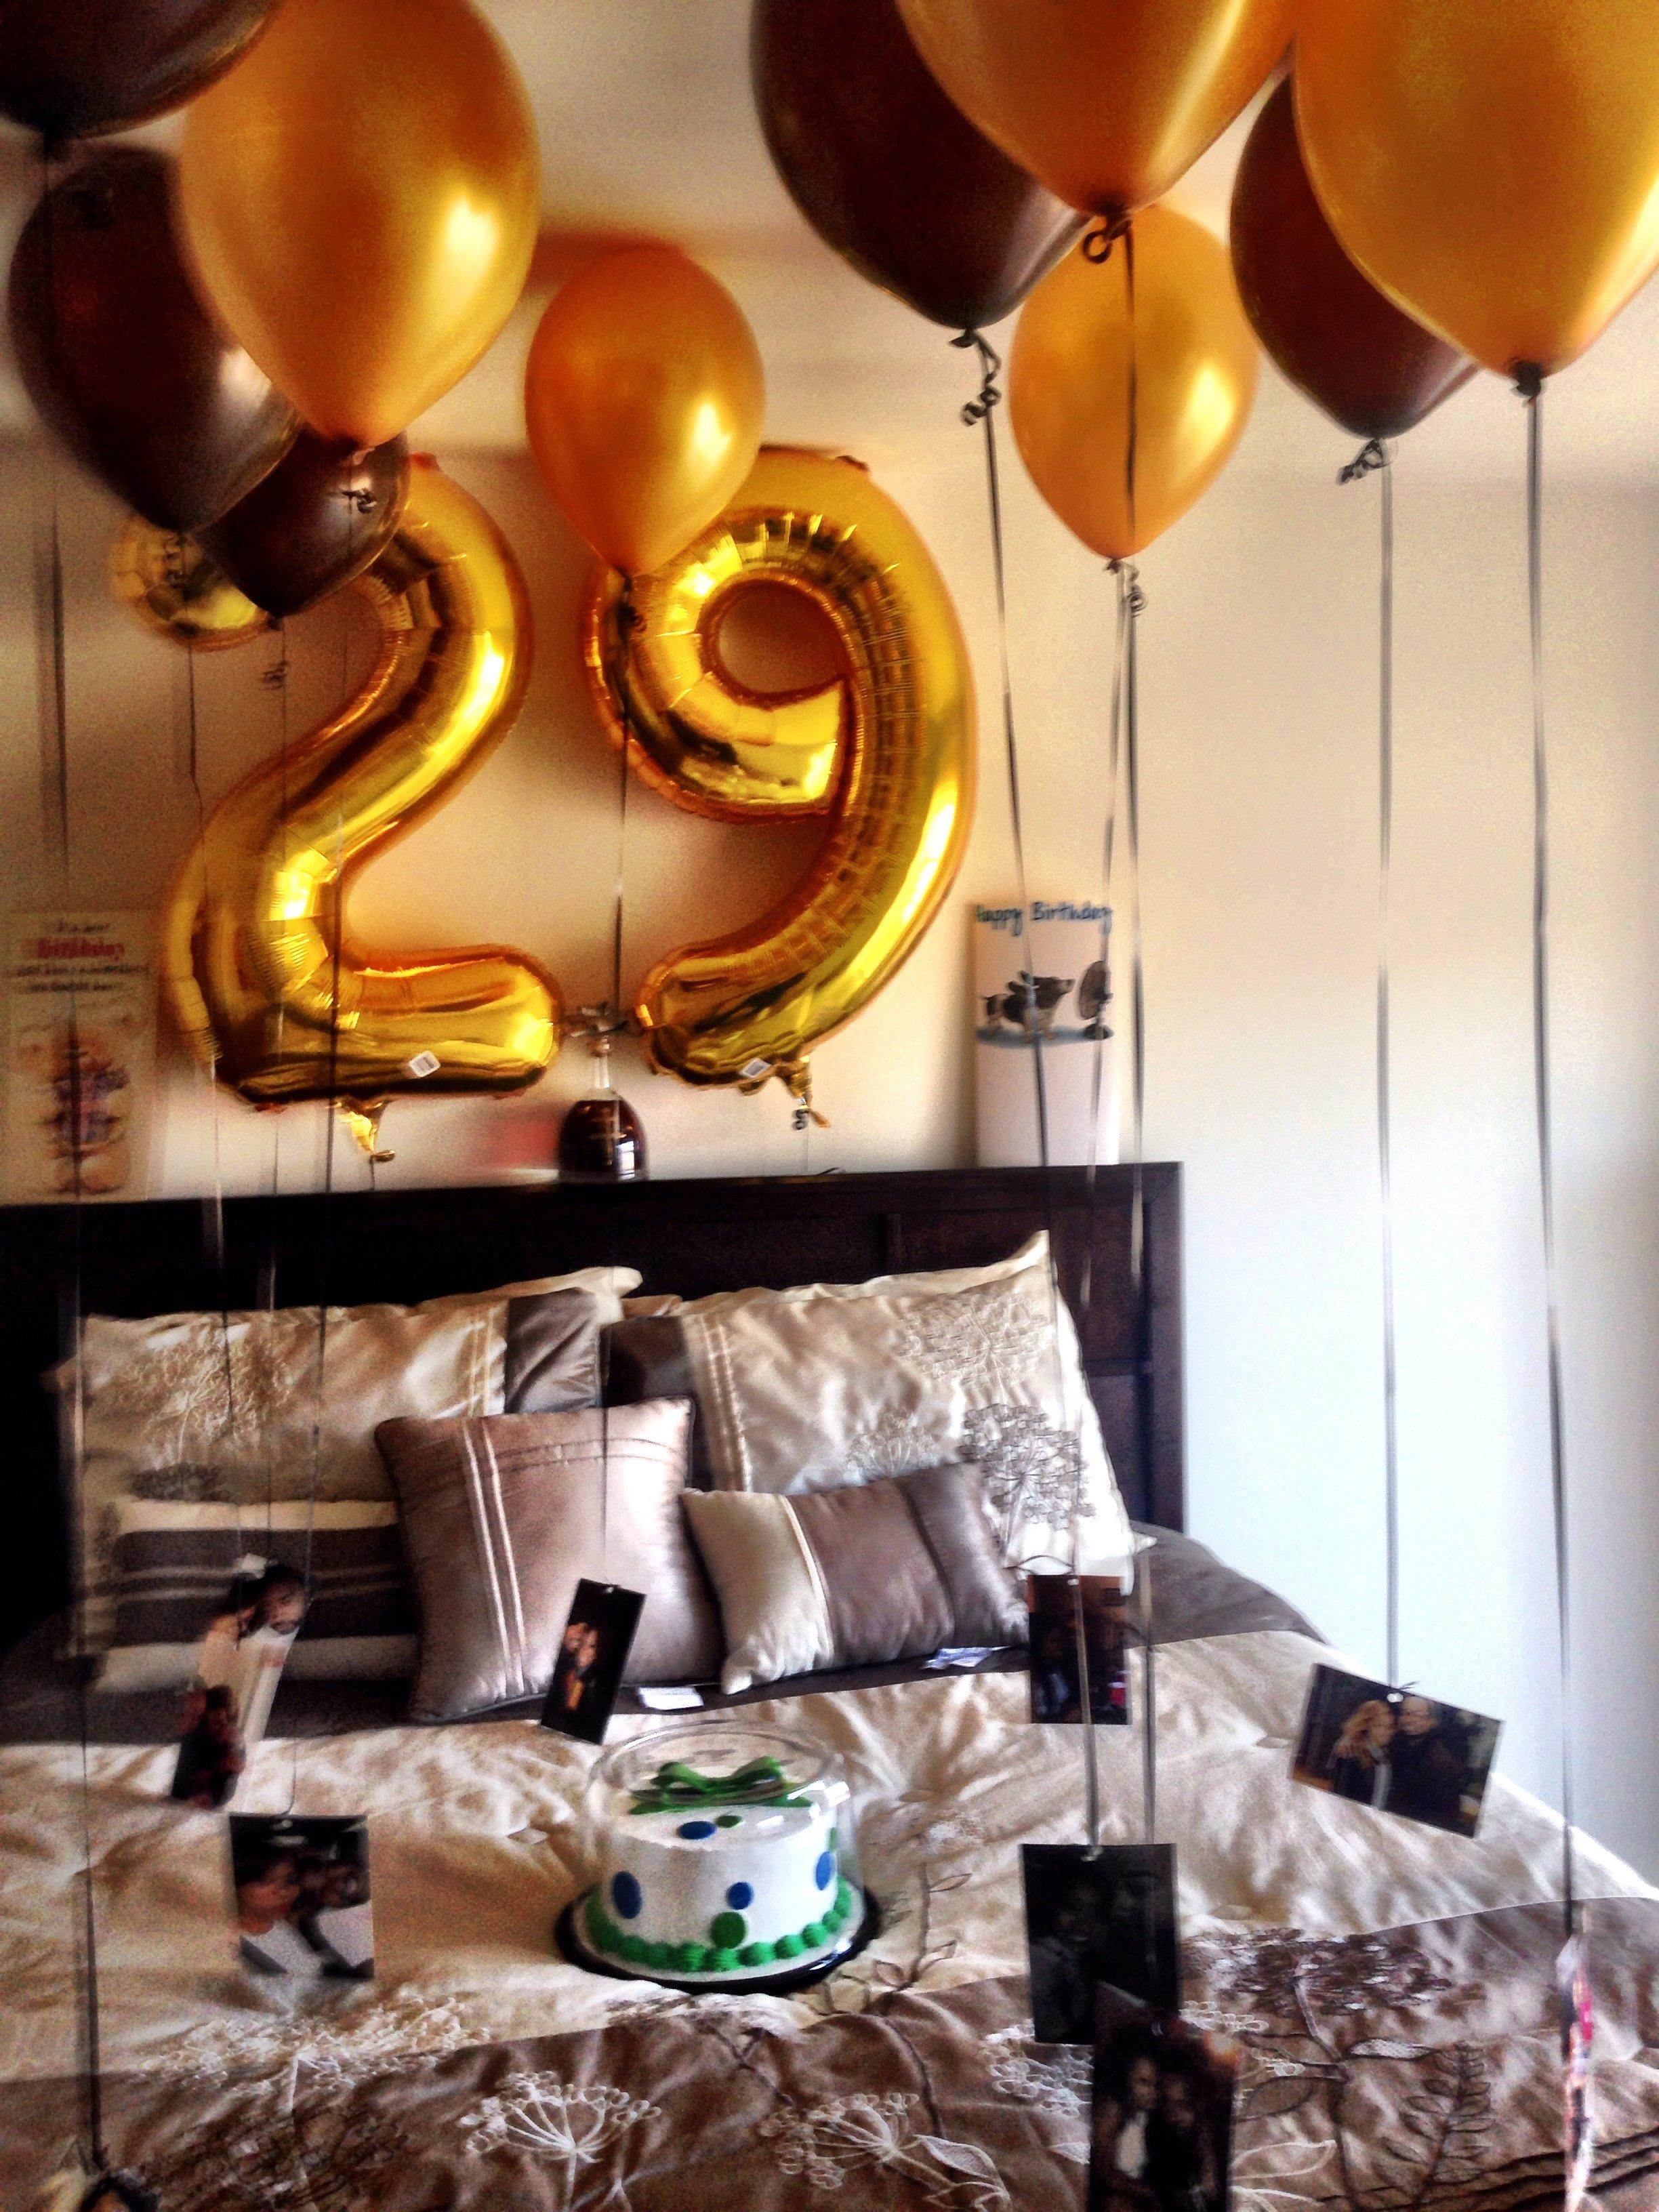 10 Pretty Best Birthday Ideas For Him boyfriends birthday birthdays pinterest boyfriends birthdays 12 2020